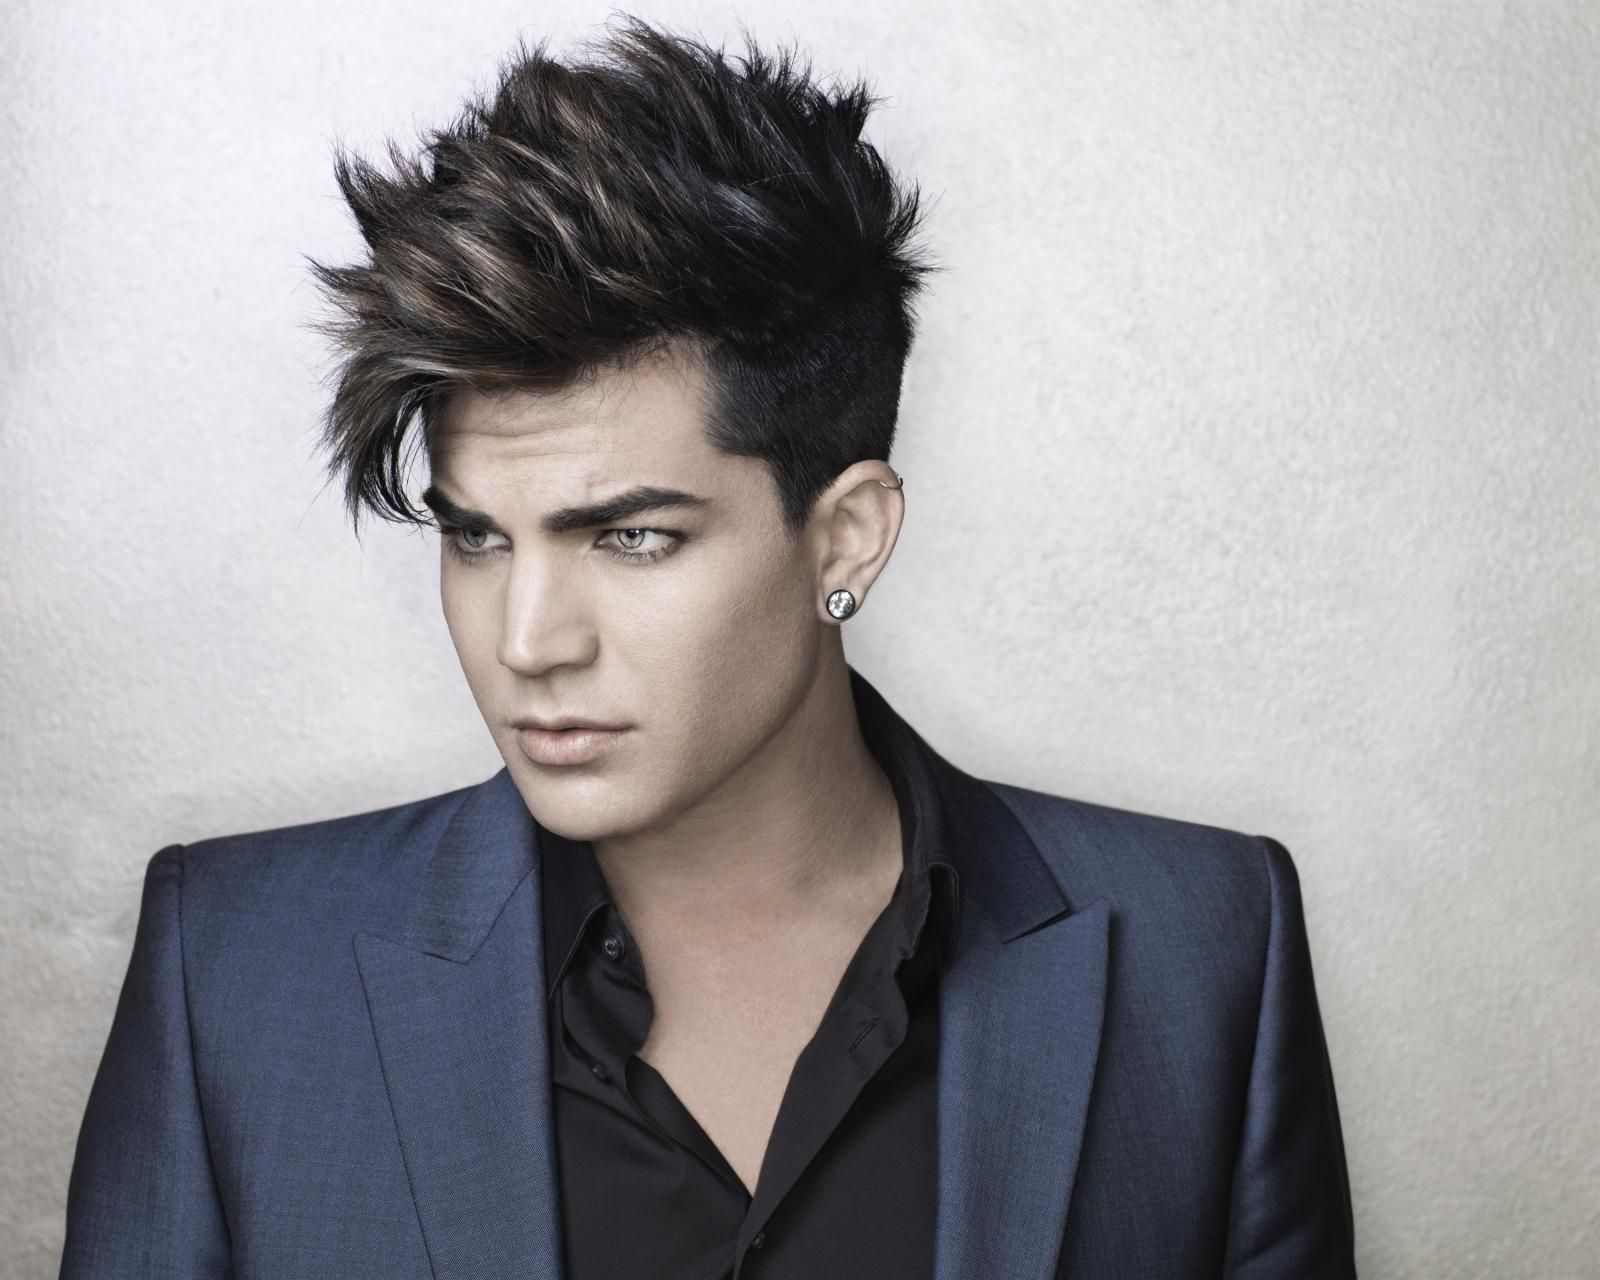 Adam Lambert Download Tracks Like Whataya Want From Me For